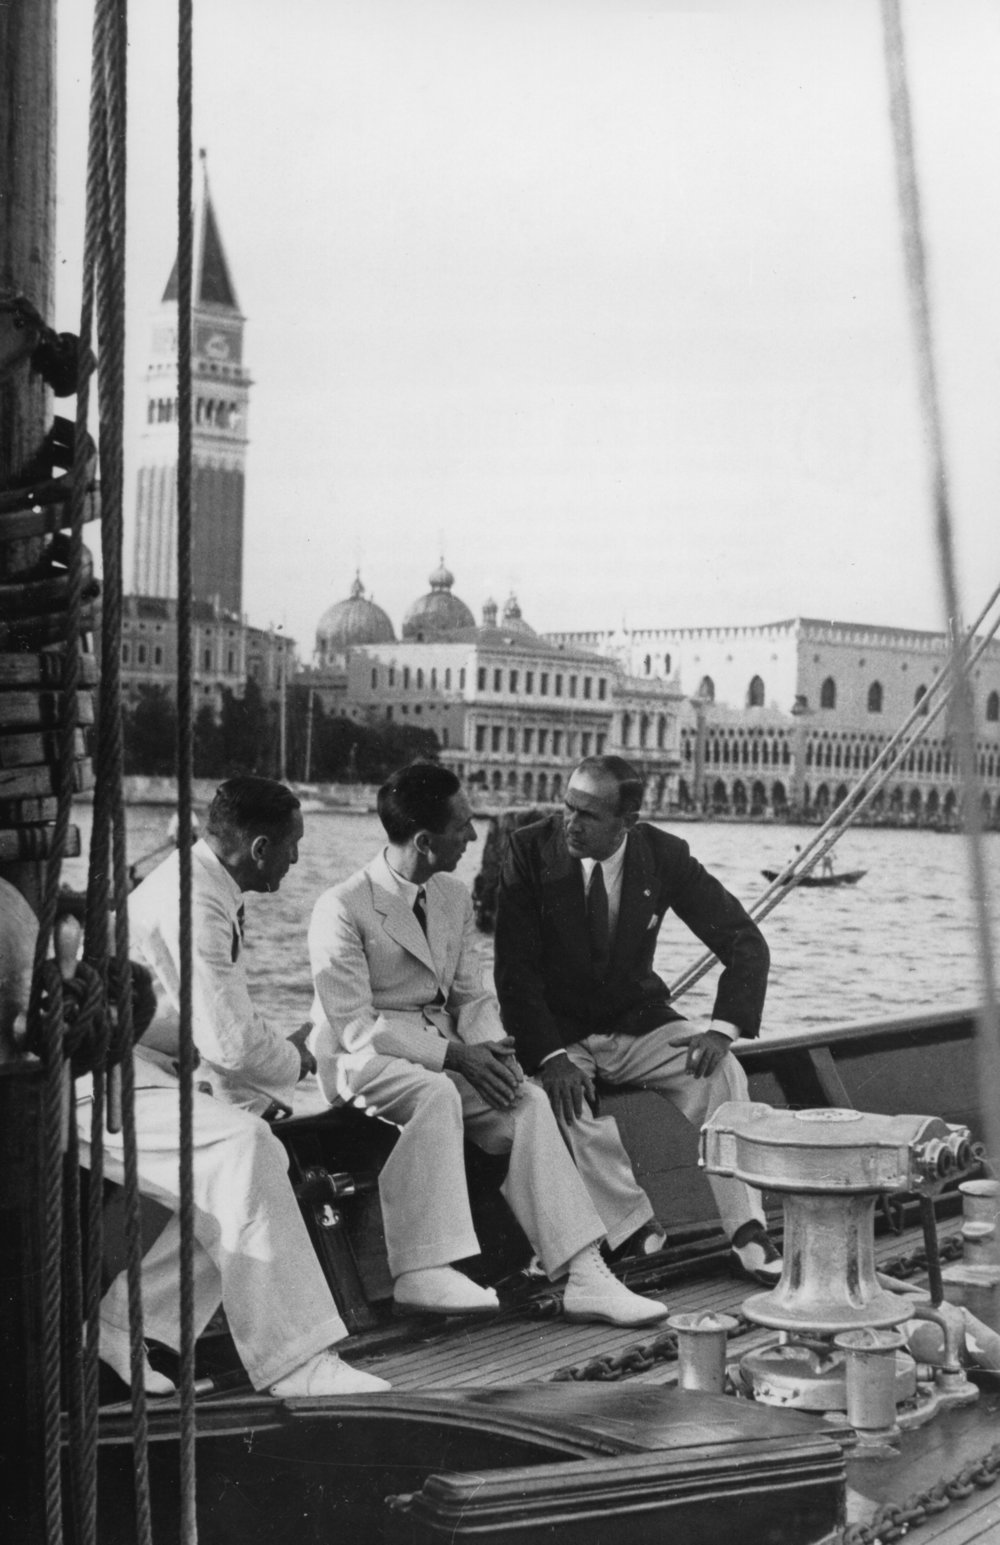 Nazi Propaganda Minister Joseph Goebbels and Mussolini's Press and Propaganda Minister Dino Alfieri, Venice 1936, featured in The Nazi-Fascist New Order for European Culture (Ullstein/IBL Bildbyrå)